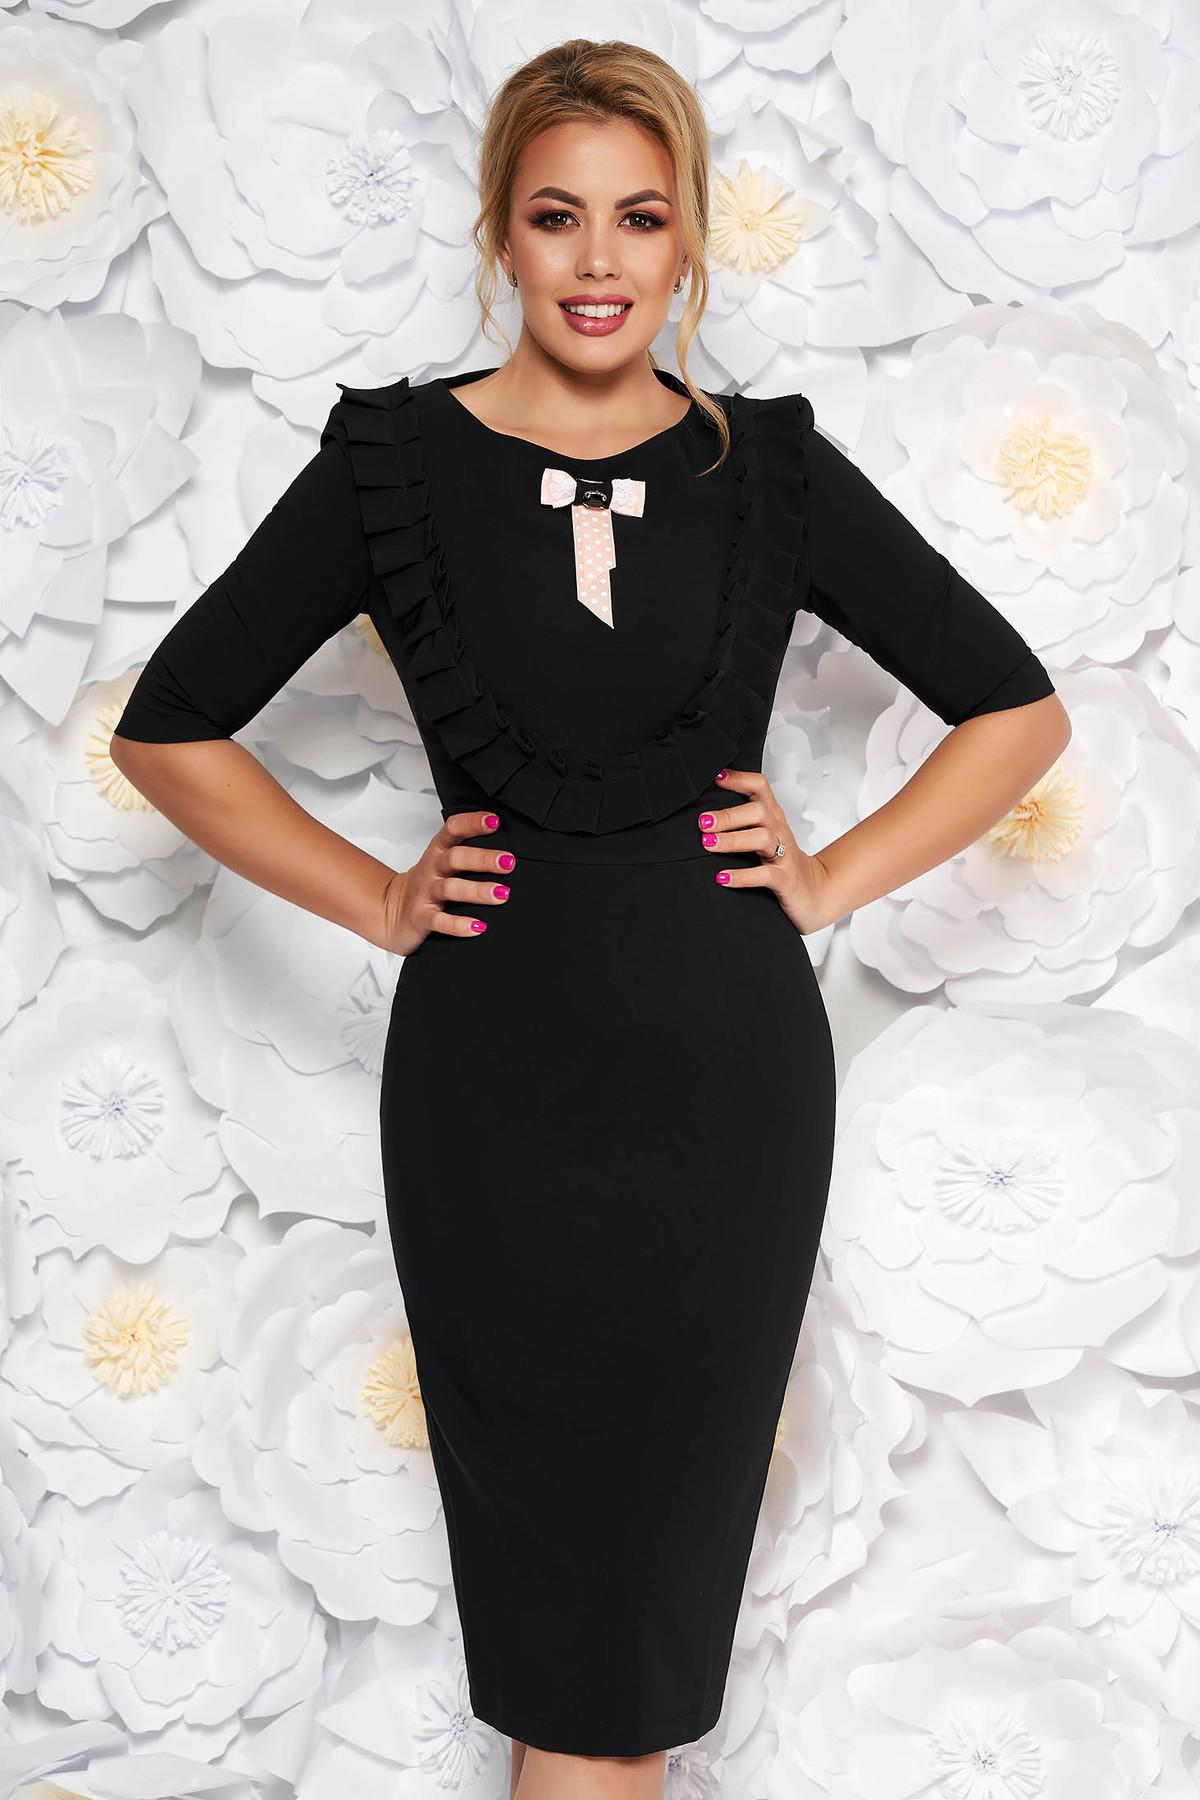 Rochie LaDonna neagra eleganta tip creion din stofa usor elastica captusita pe interior accesorizata cu brosa